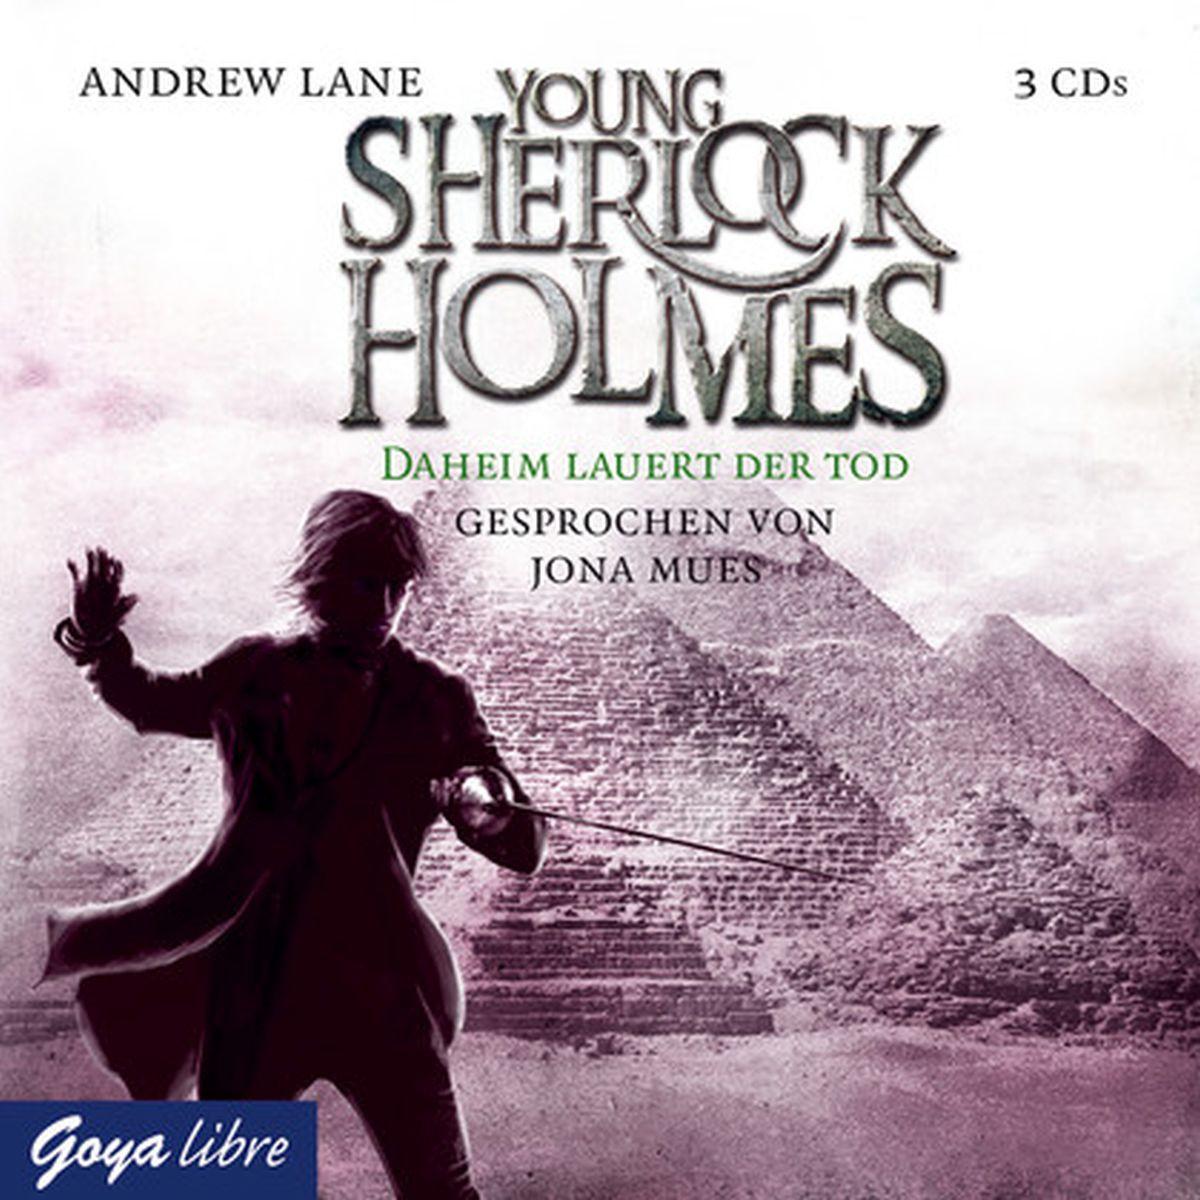 Andrew Lane: Young Sherlock Holmes (8) Daheim lauert der Tod